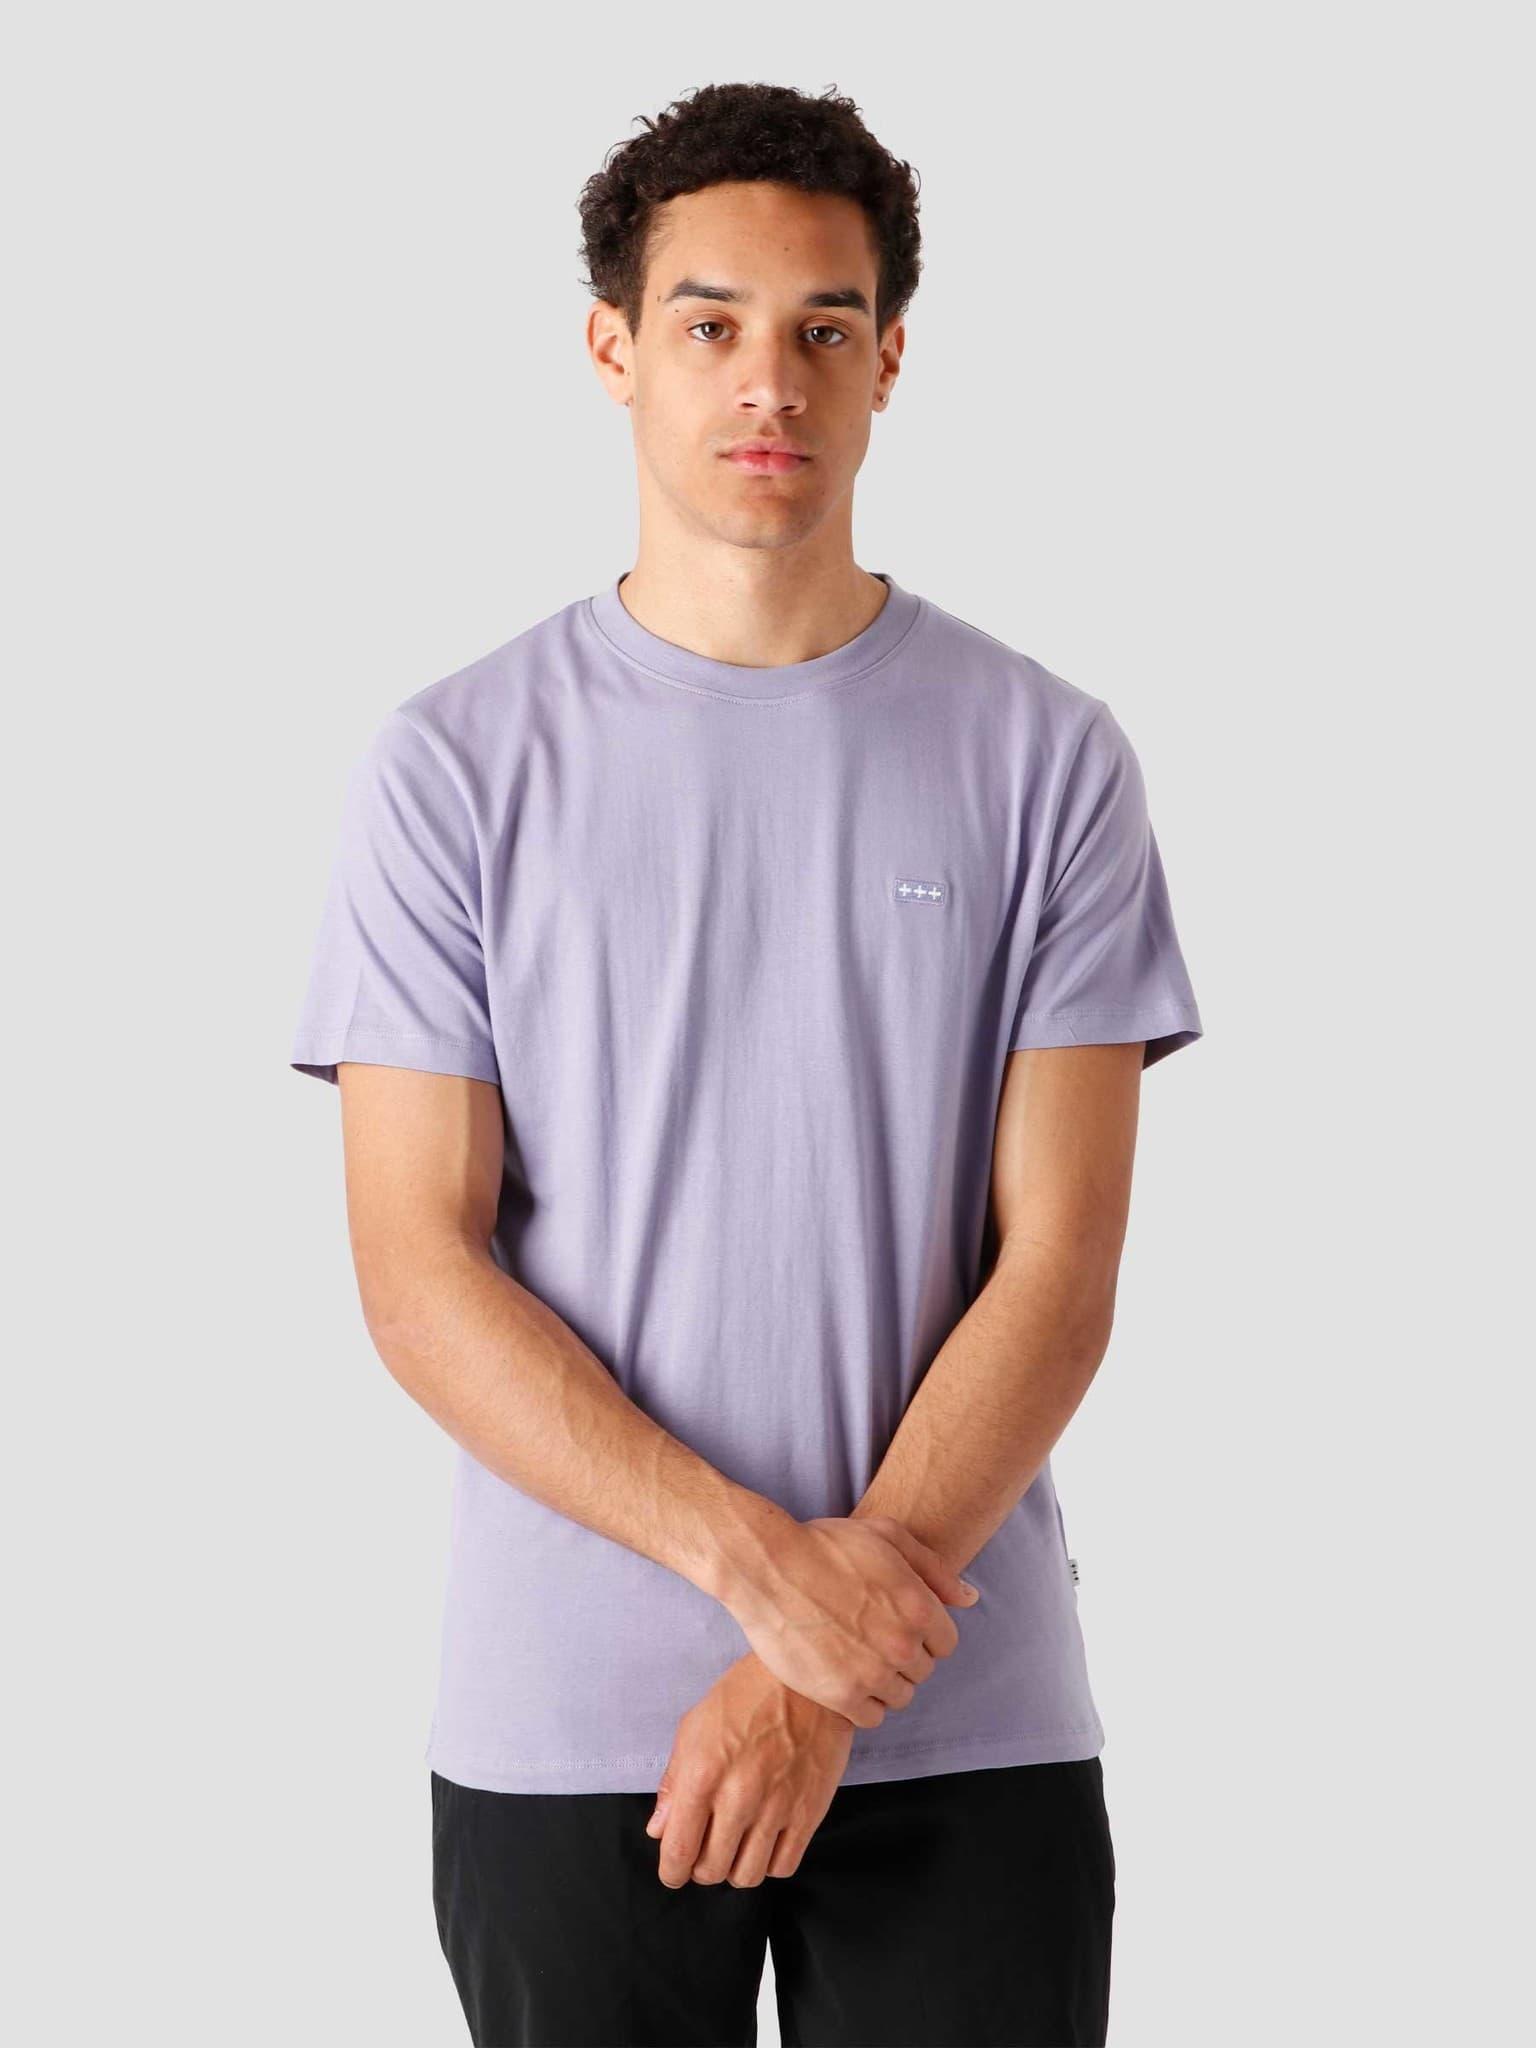 QB03 Patch Logo T-shirt Dusty Lilac